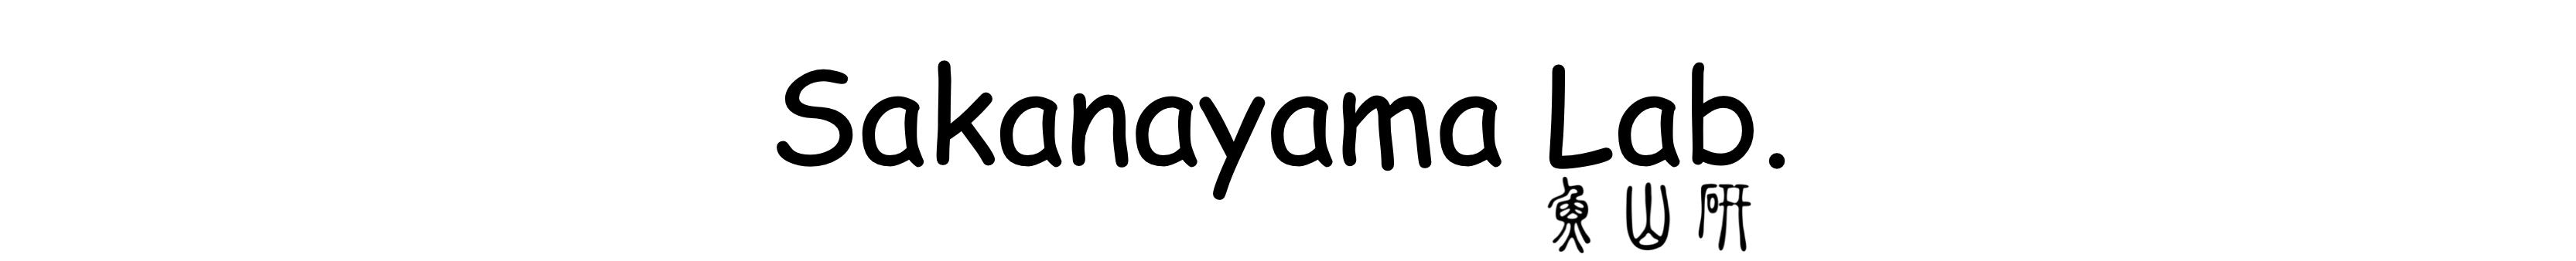 Sakanayama Lab.